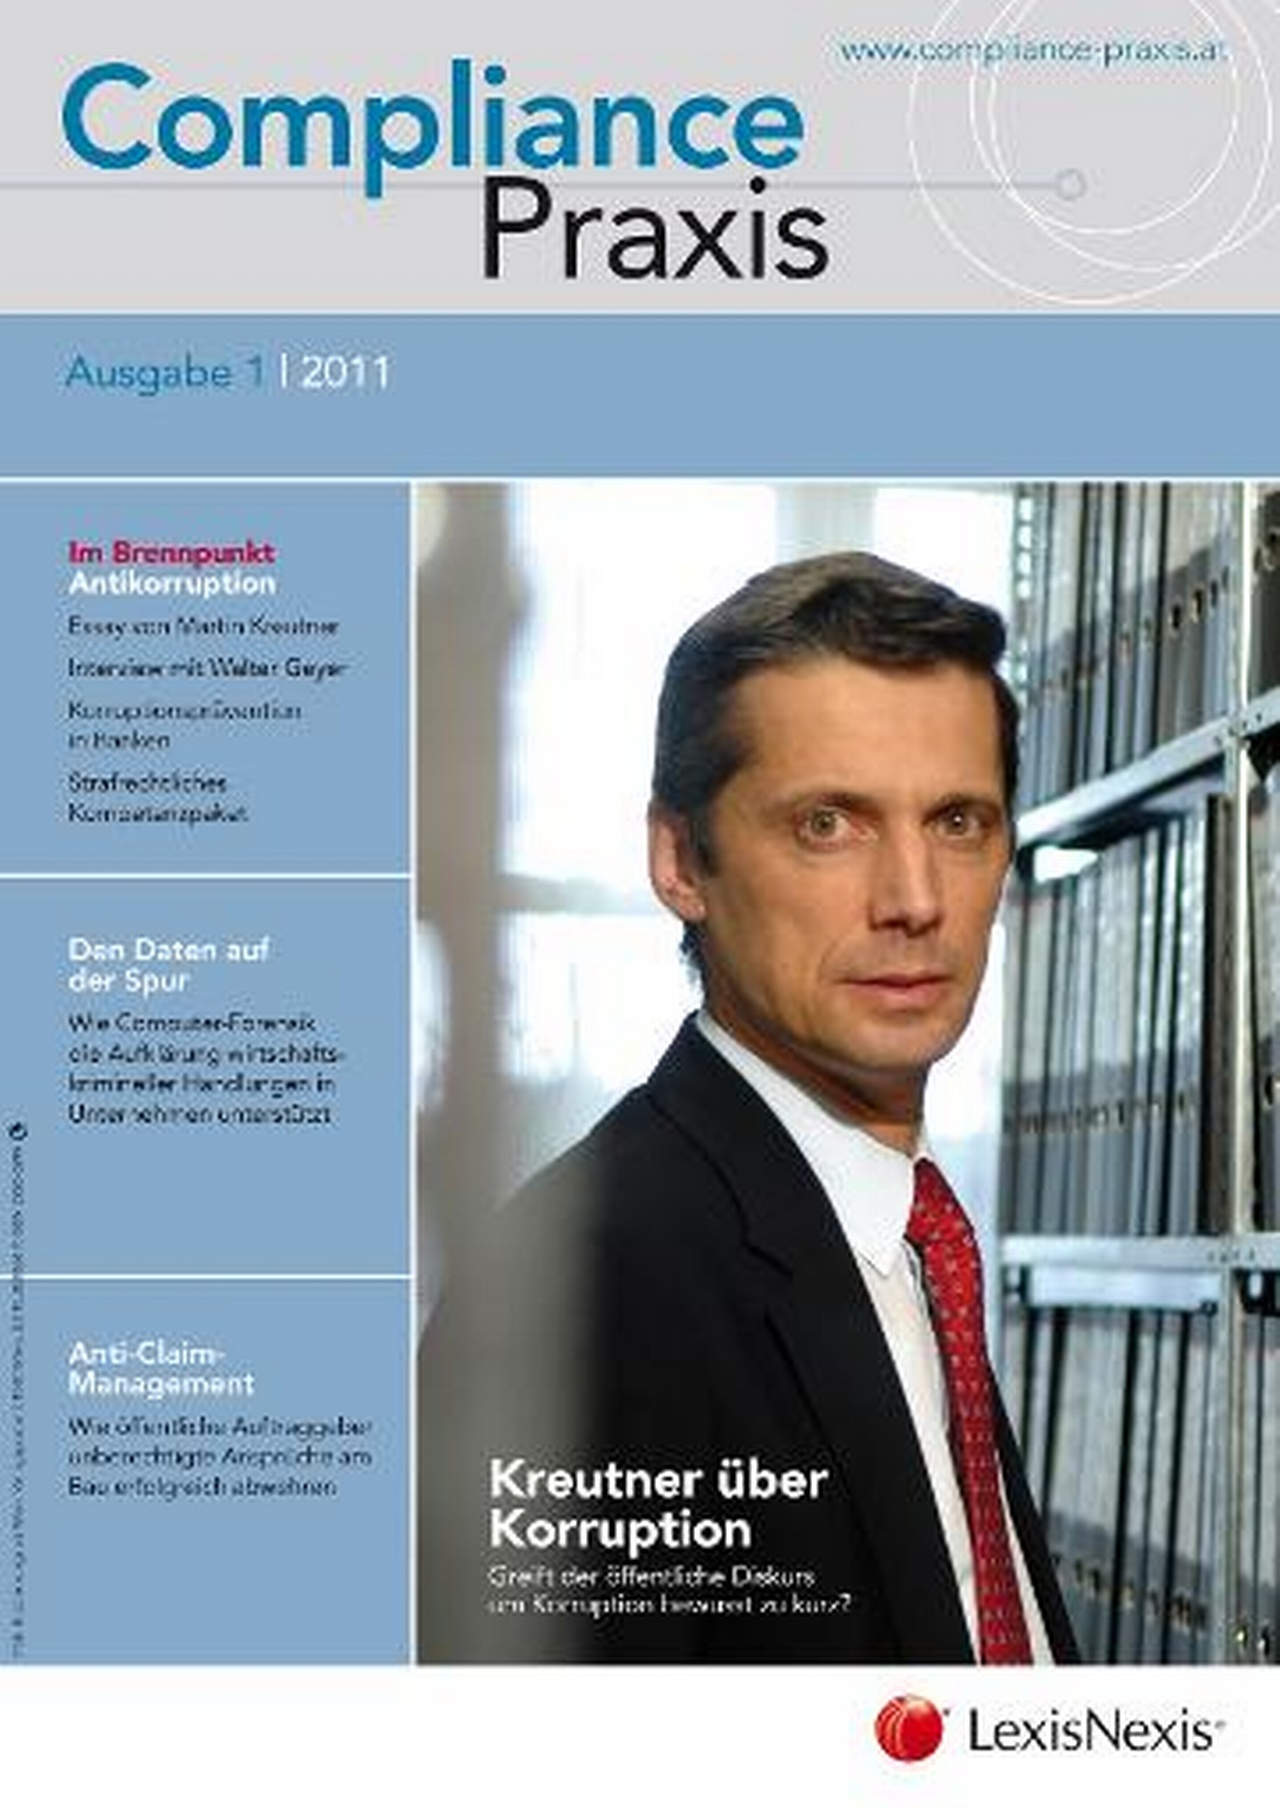 Cover von Compliance Praxis Ausgabe 1/2011, © LexisNexis